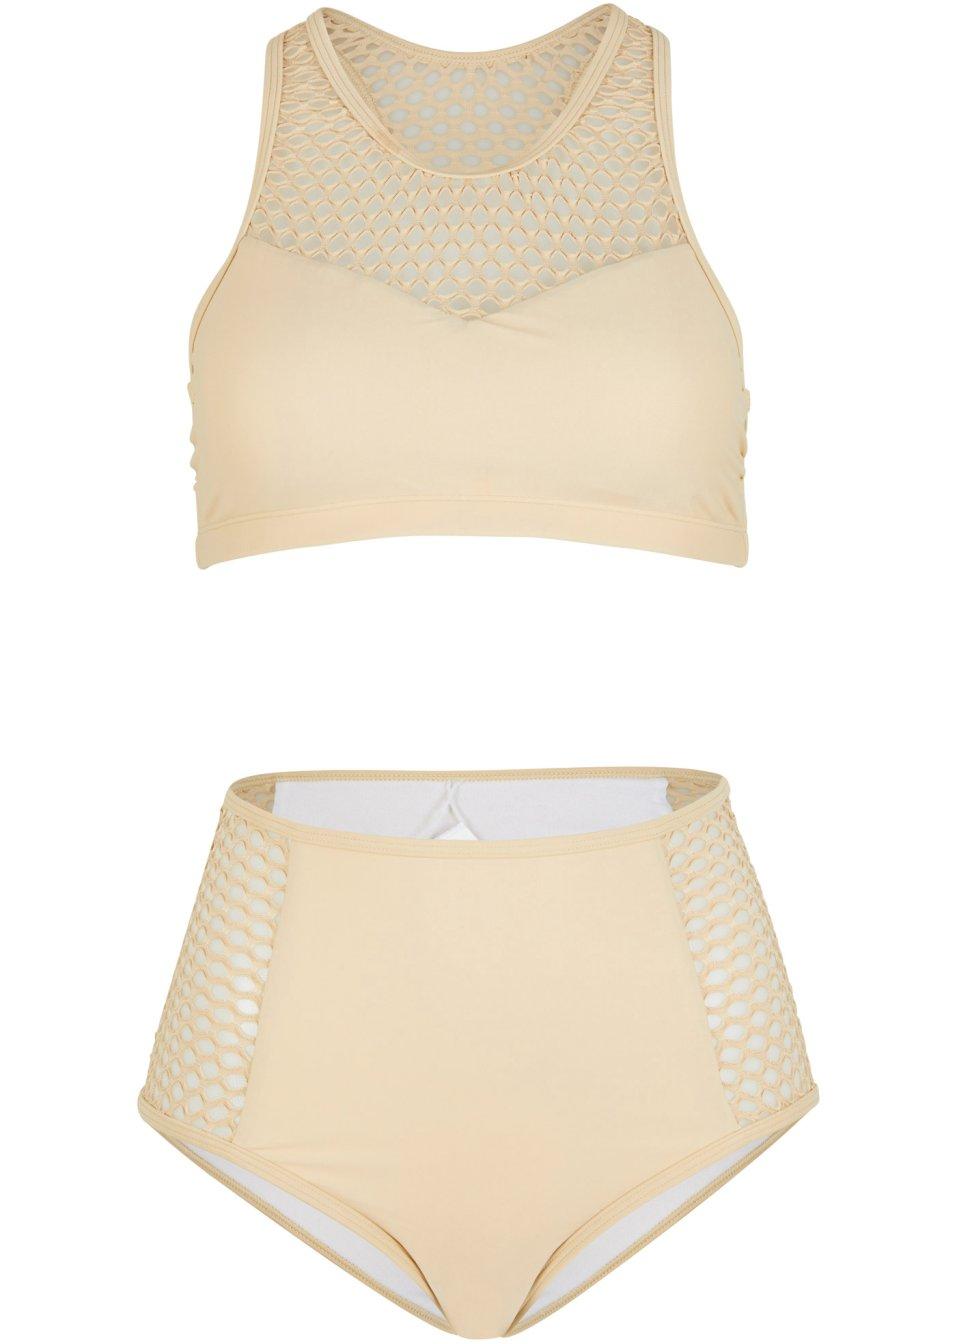 Modischer Bustier Bikini mit High-Waist Bikinihose - beige 6fZx8 J0aTs